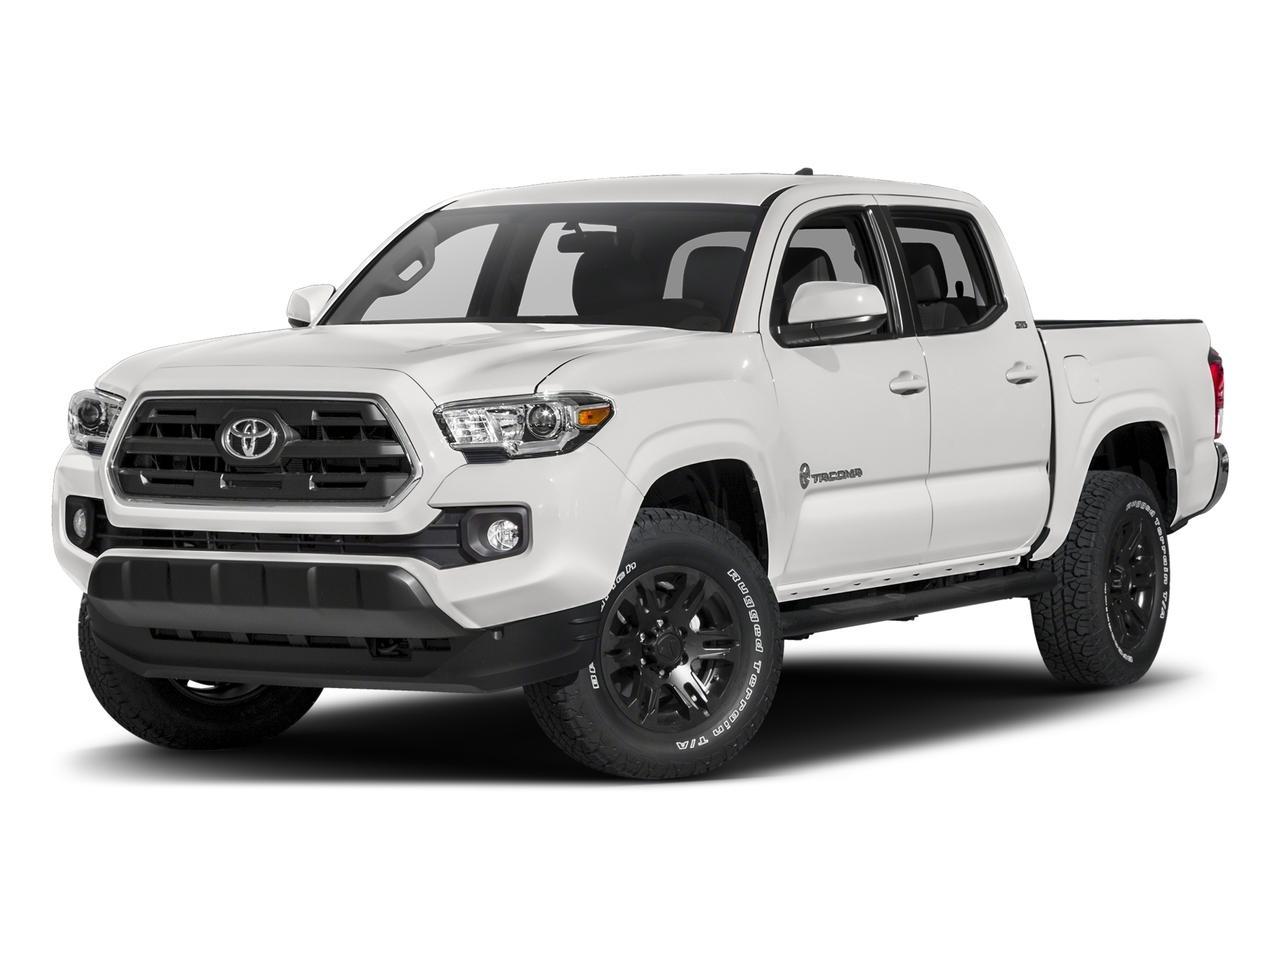 2017 Toyota Tacoma Vehicle Photo in San Antonio, TX 78238